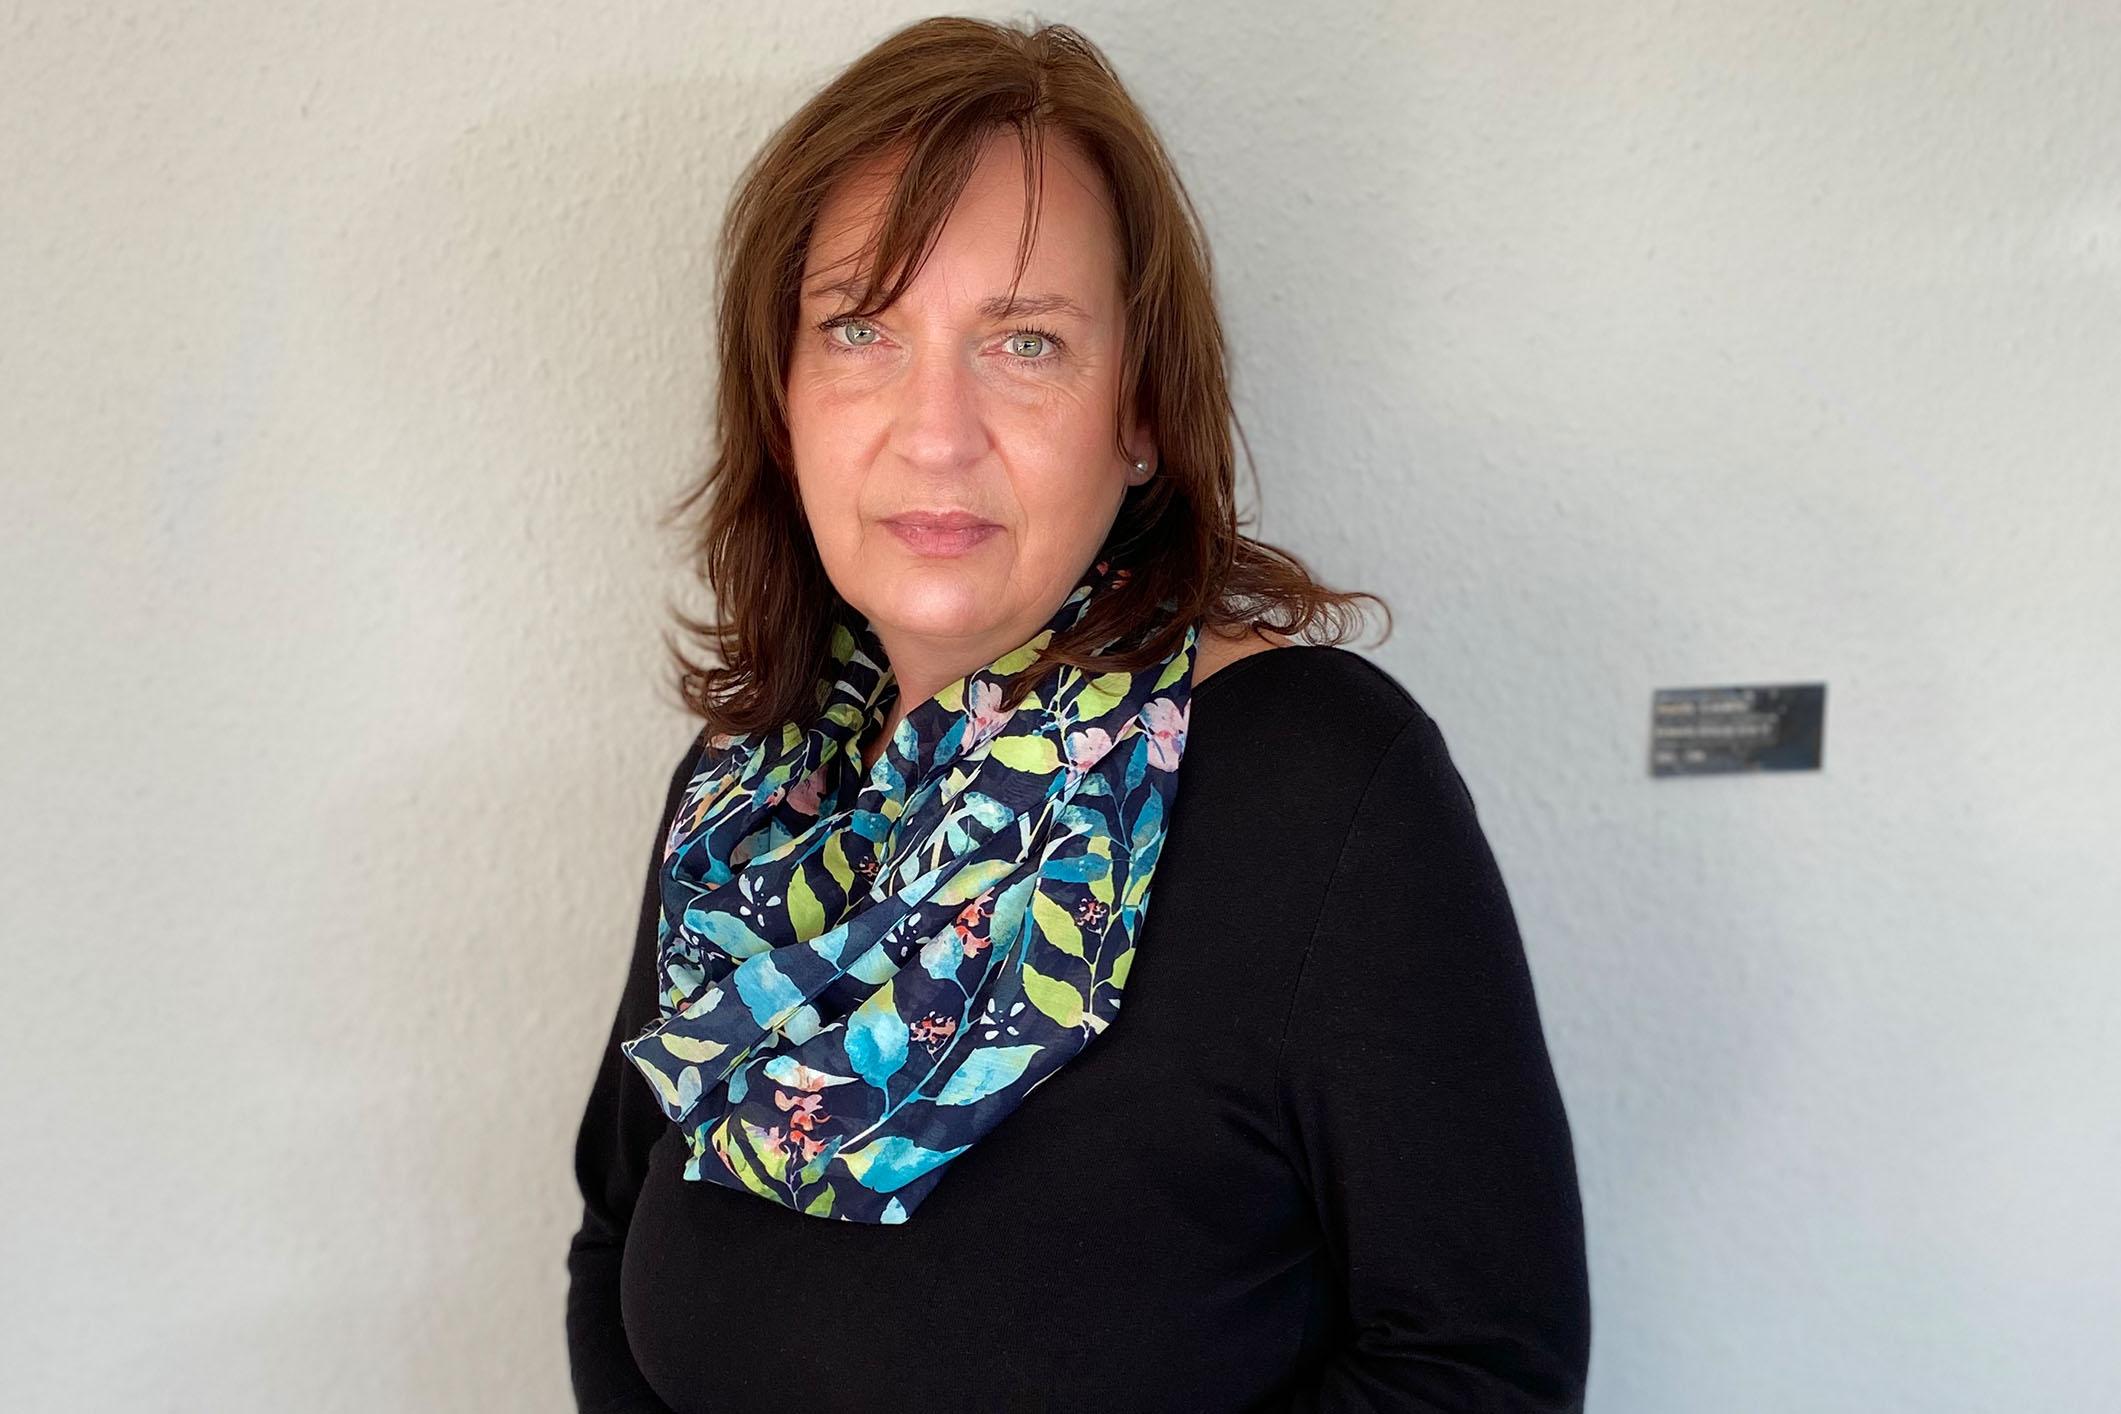 Anja Franz